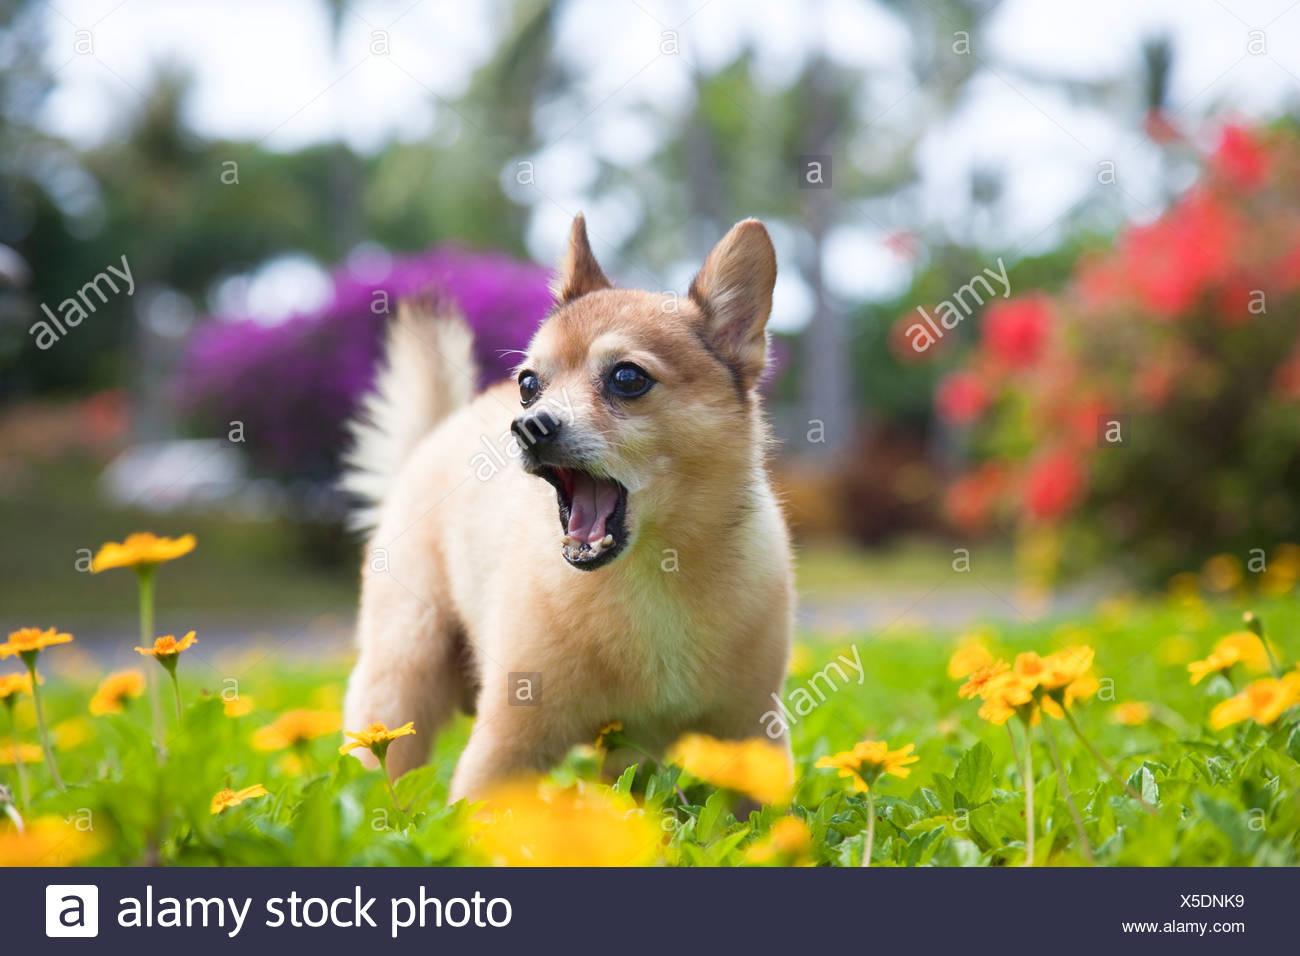 Our Pet Dog Kekai Hes Half Pomeranian And Half Fox Terrier Stock